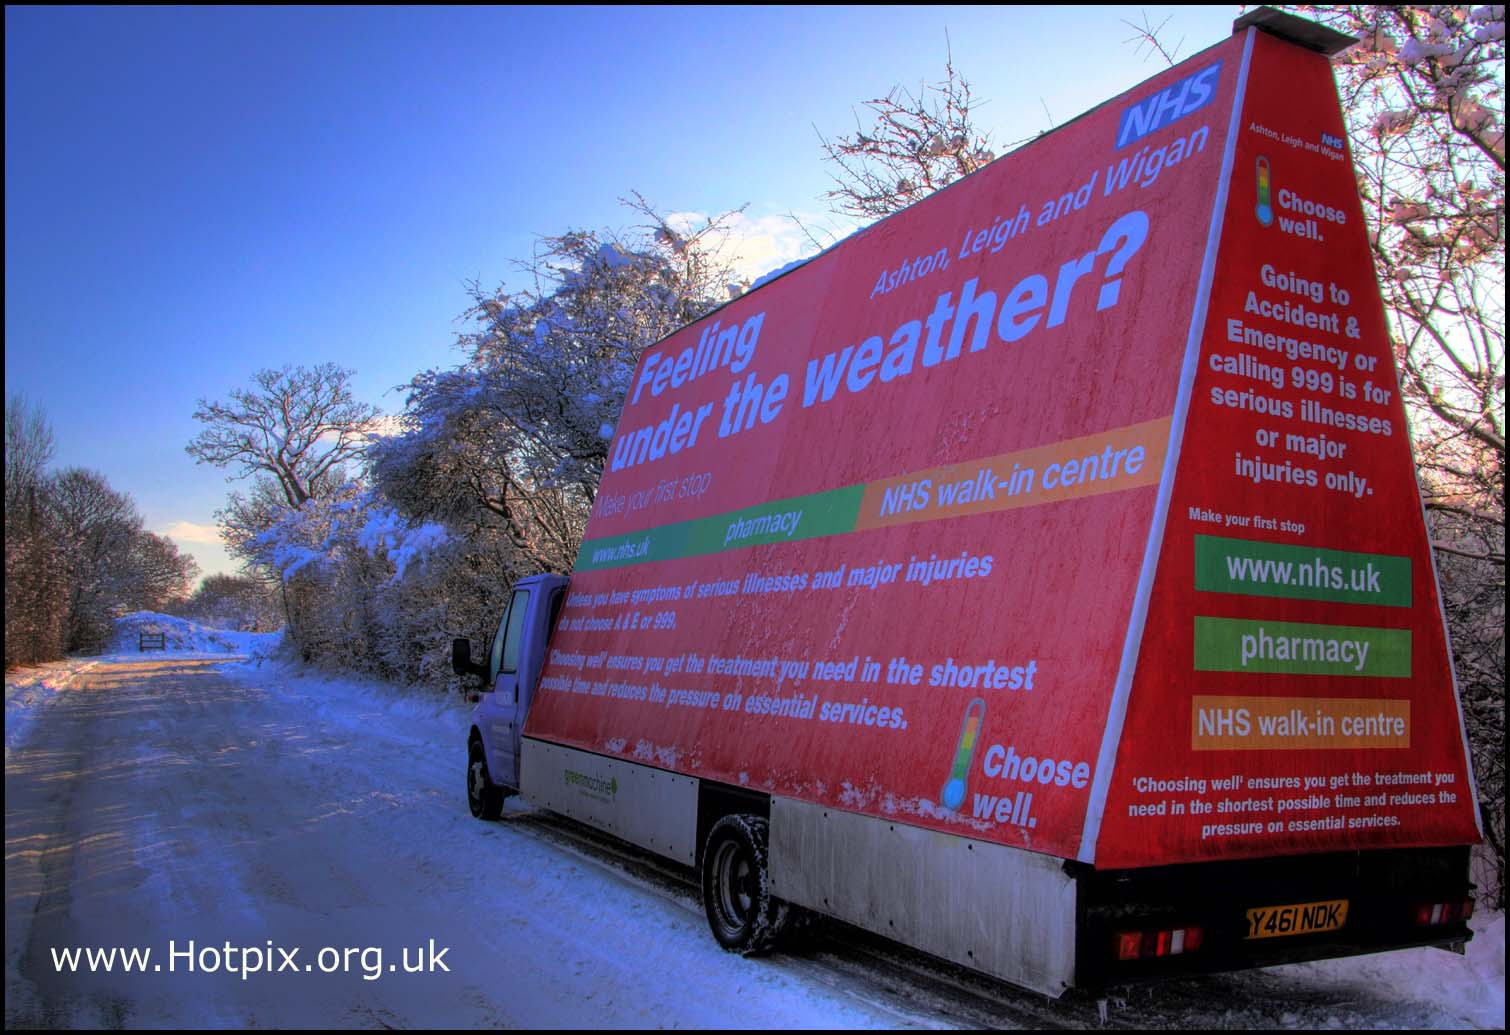 NHS,van,ashton,wigan,lancs,lancashire,north,west,england,britain,red,blue,wnow,ice,winter,cold,vehicle,grappenhall,weaste,lane,ln,cheshire,warrington,UK,january,2010,big,freeze,britains,Yikker,HDR,high dynamic range,rot-rosso-rouge-rood,Hotpicks,hotpics,hot,pics,pix,picks,highway,road,hotpix.freeserve.co.uk,hotpix!